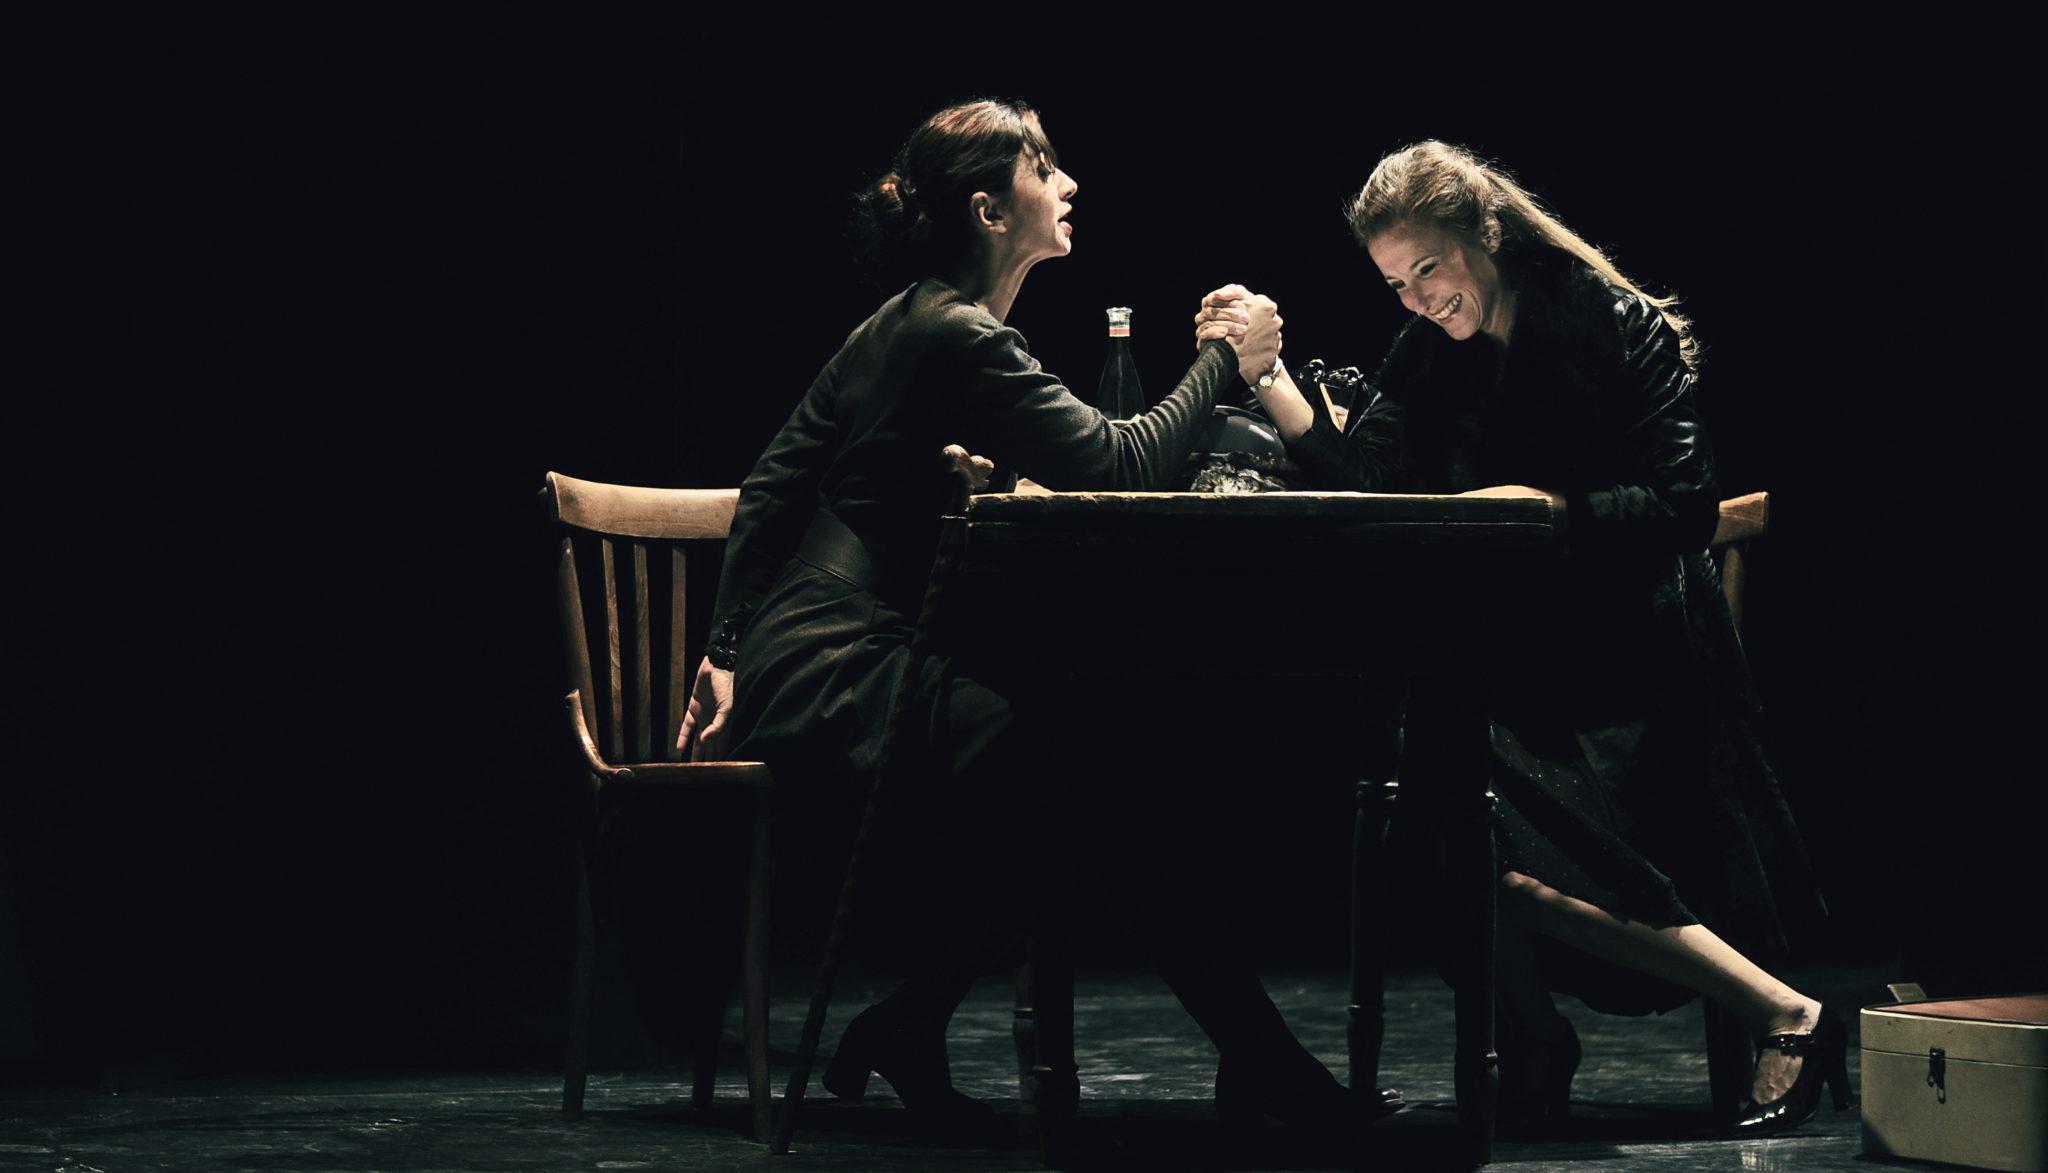 http://www.teatrolibero.it/events/2013-2014/io-e-julia